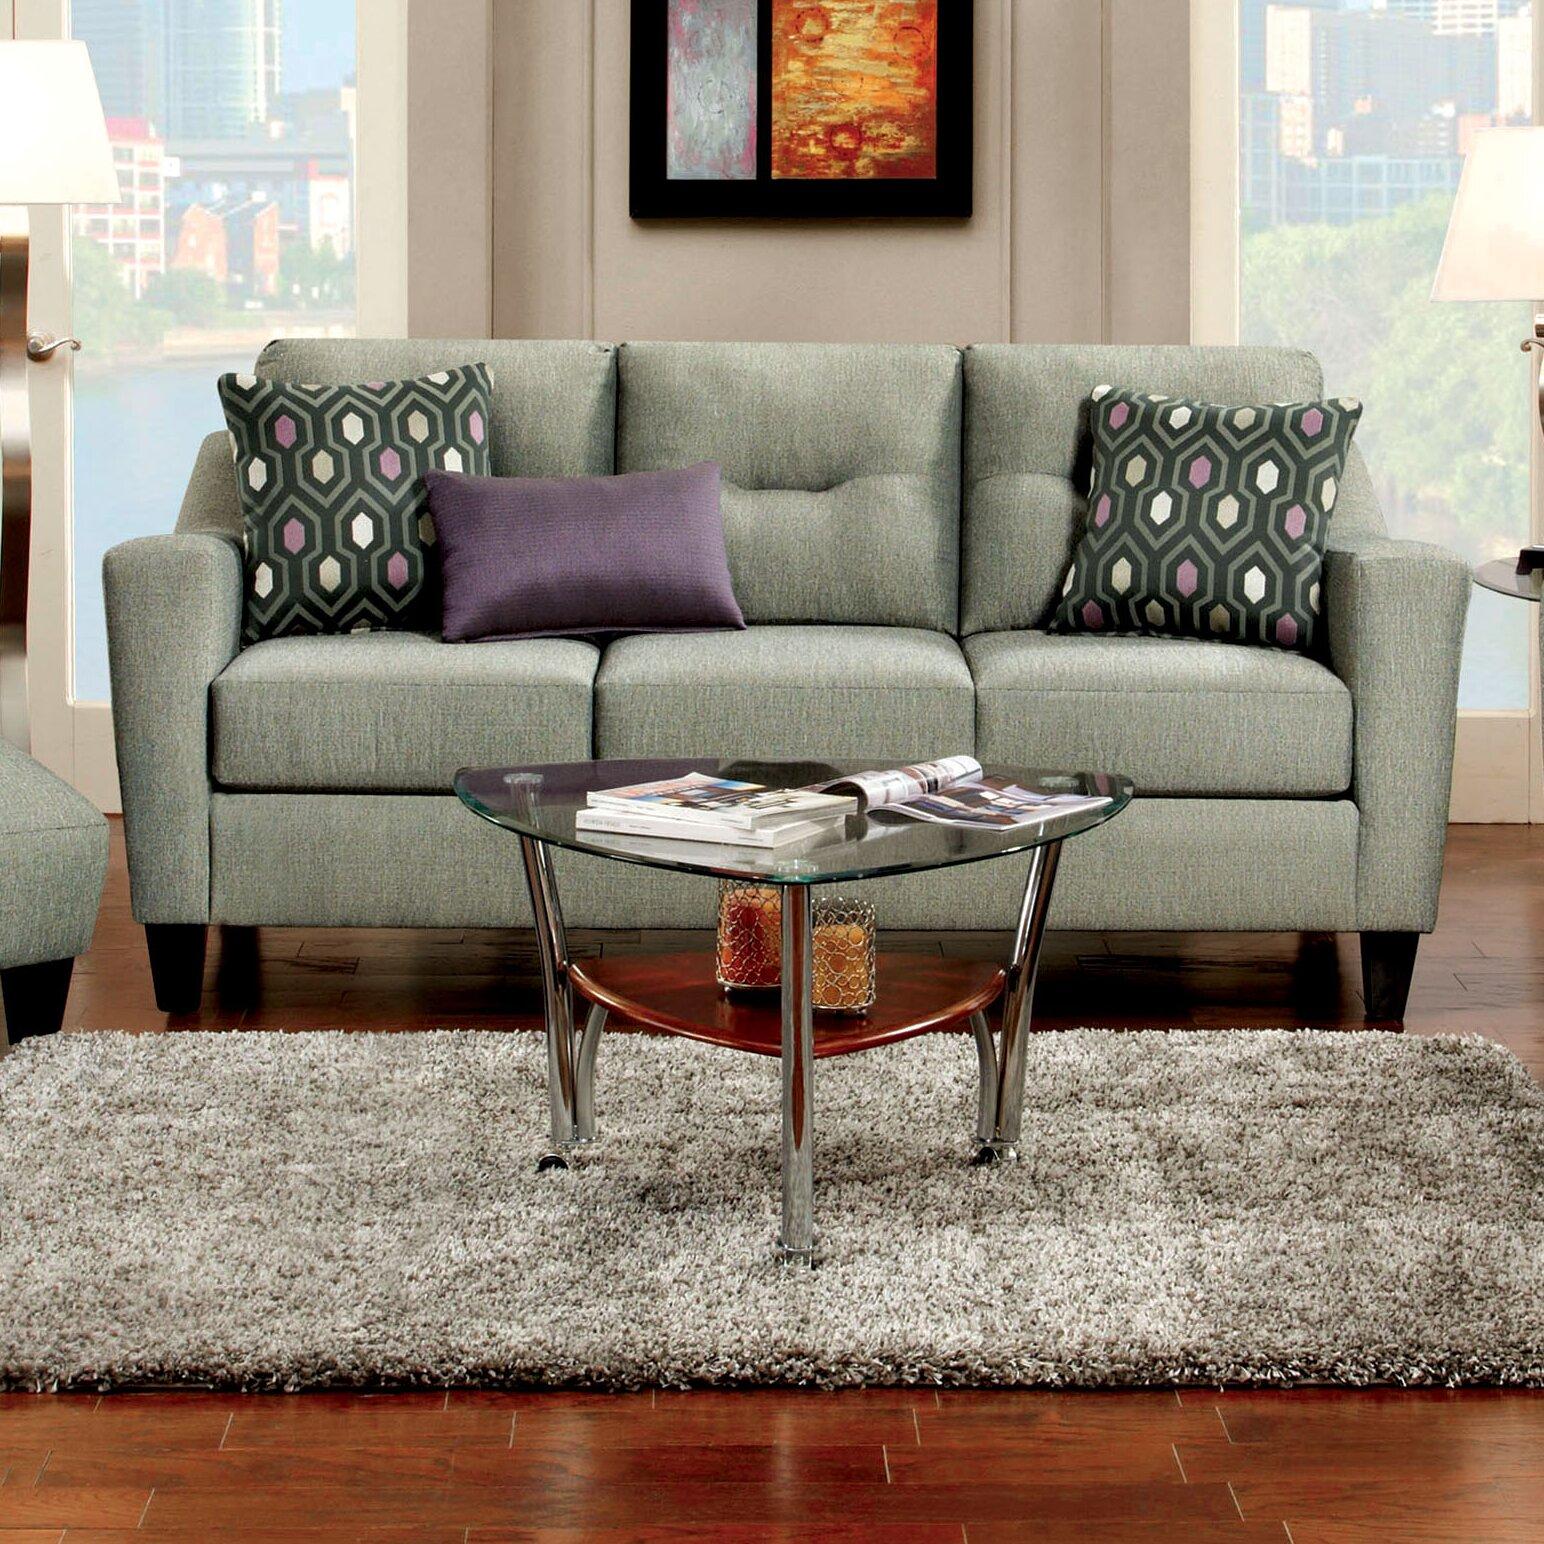 Hokku Designs Hokku Designs Violette Modern Sofa Reviews Wayfair